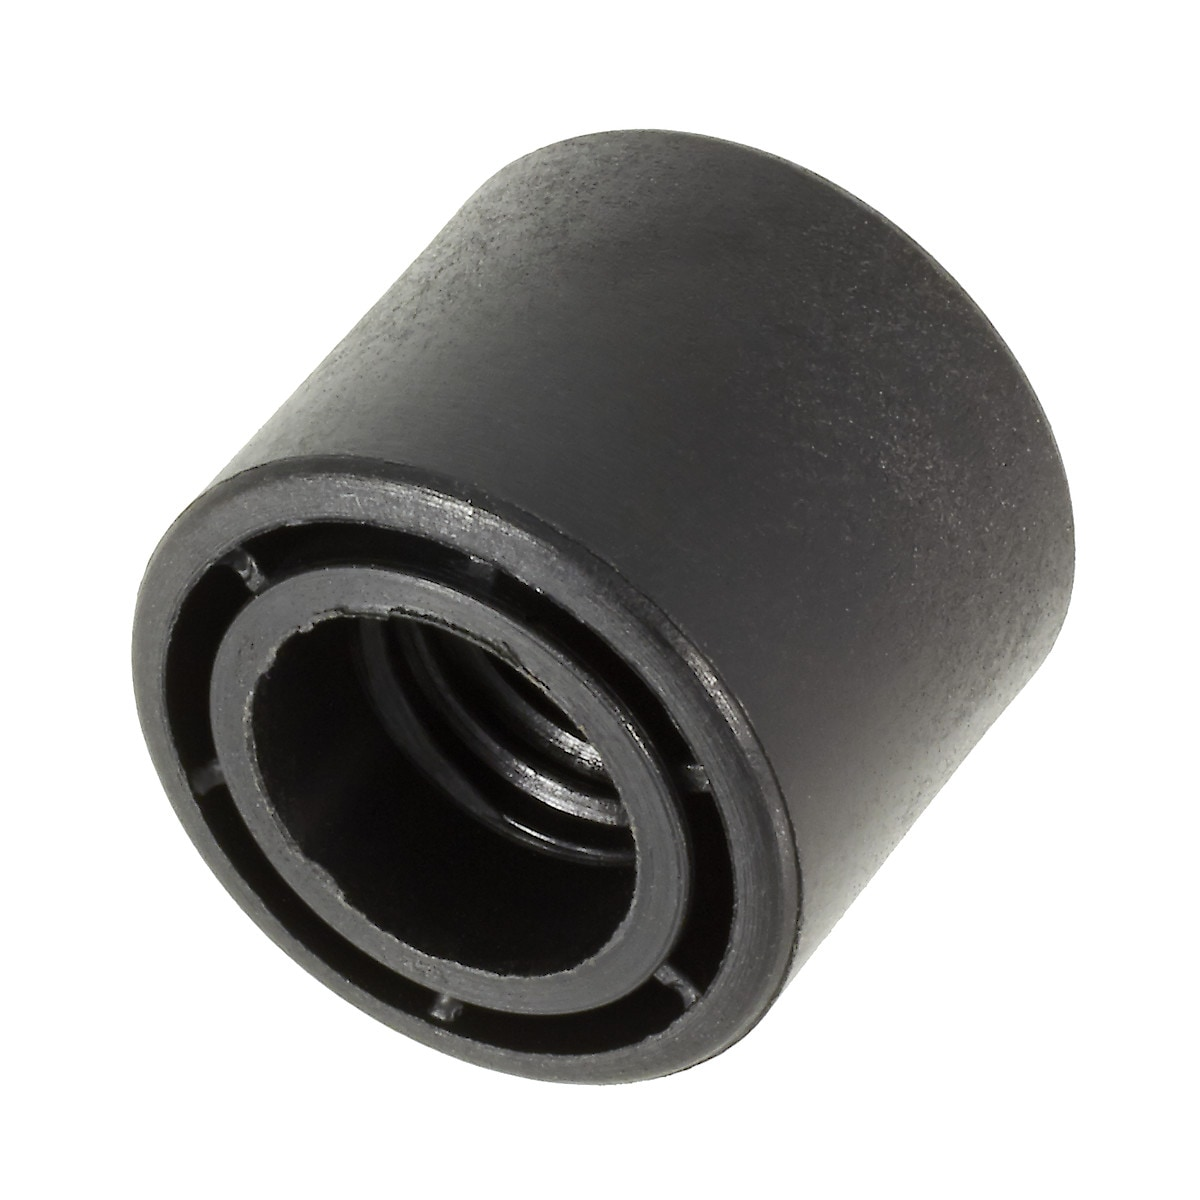 Drivrulle M14x2,0